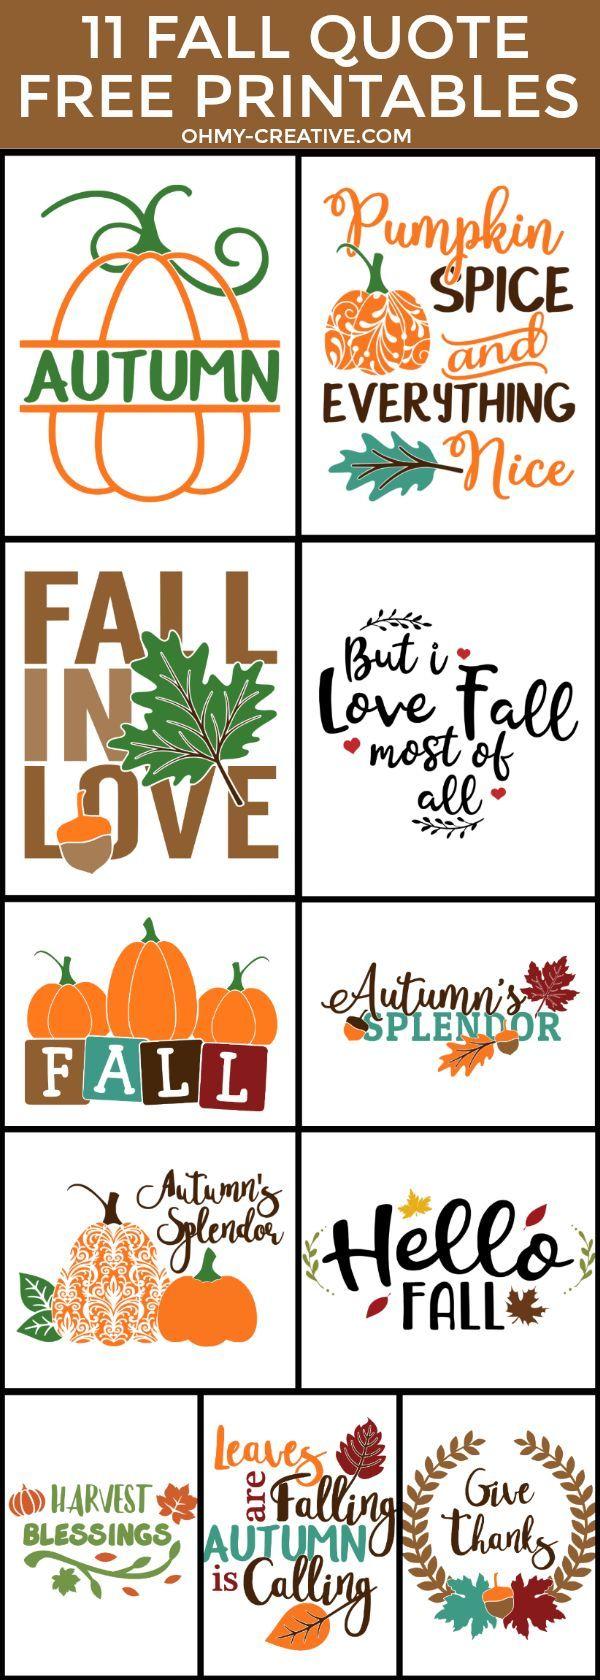 Fall Quotes Free Printables For Autumn - #autumn #printables #quotes - #DecorationAutumn #fallseason